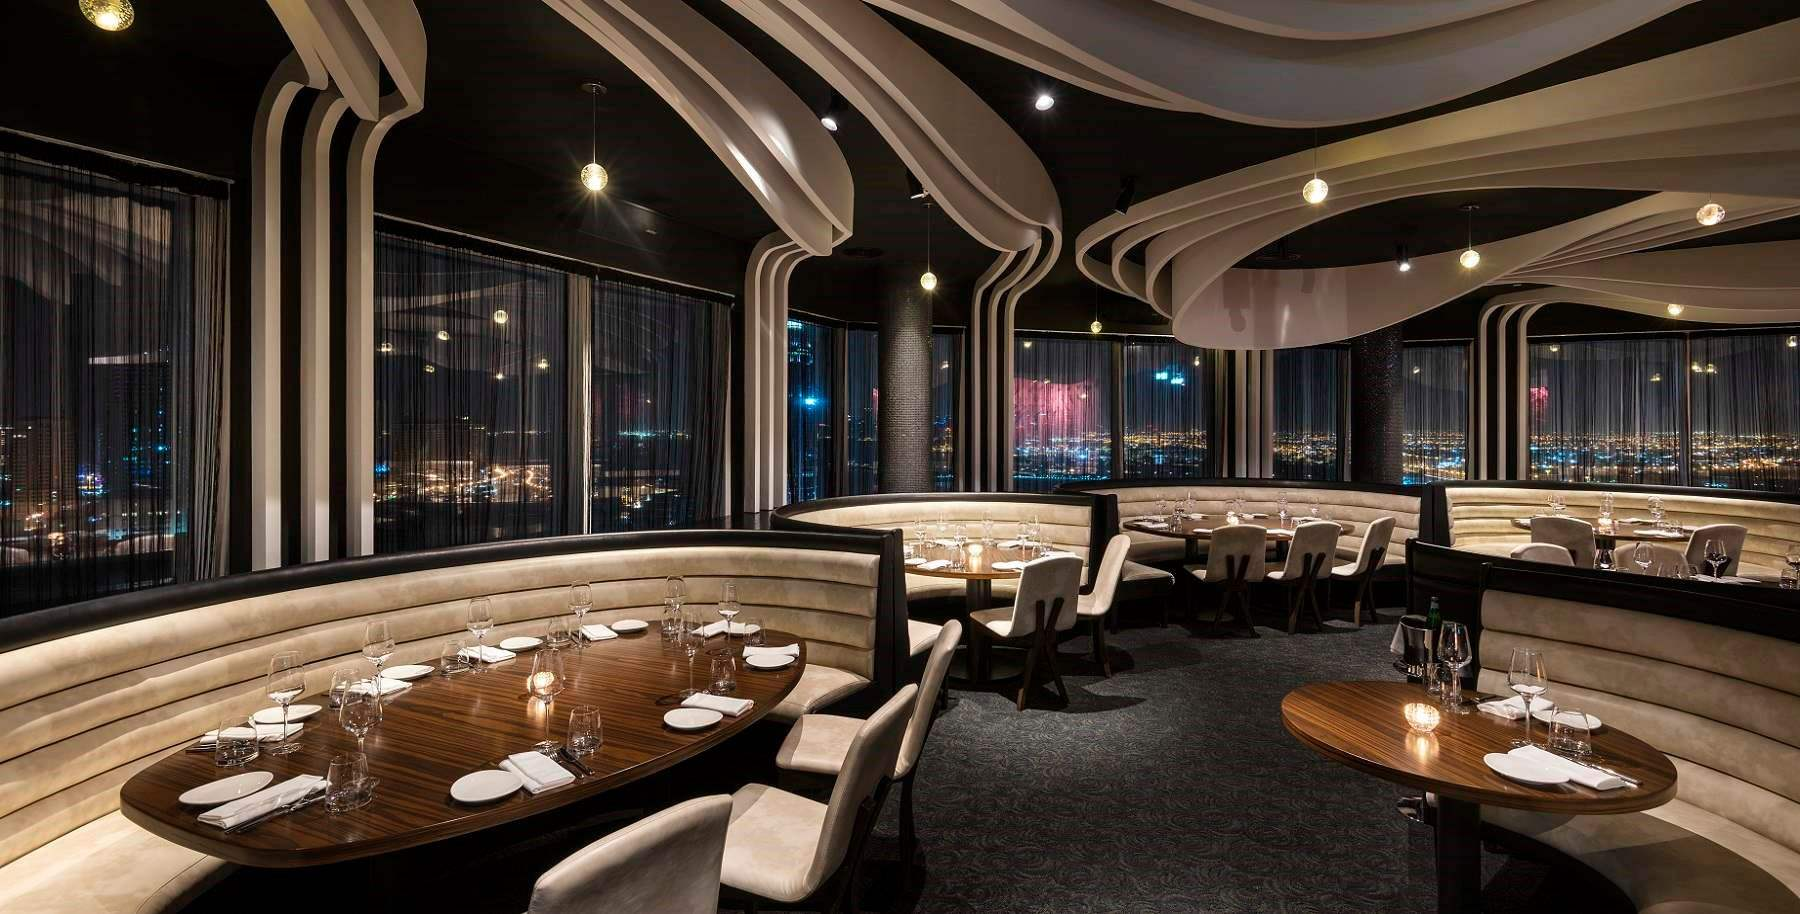 STK Doha, The Ritz-Carlton, Doha, West Bay Lagoon